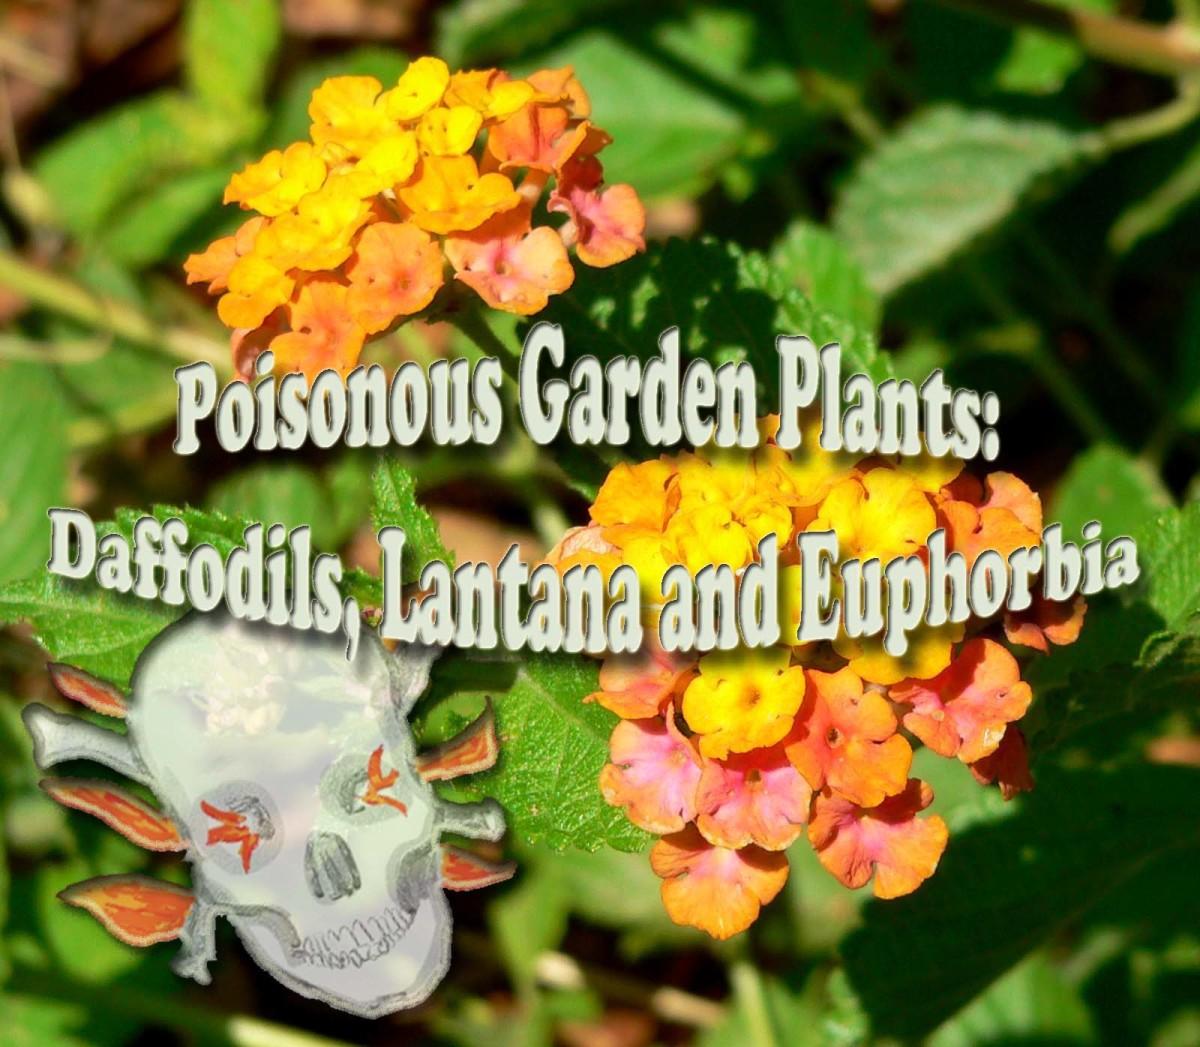 poisonous_garden_plants_daffodil_lantana_euphorbia